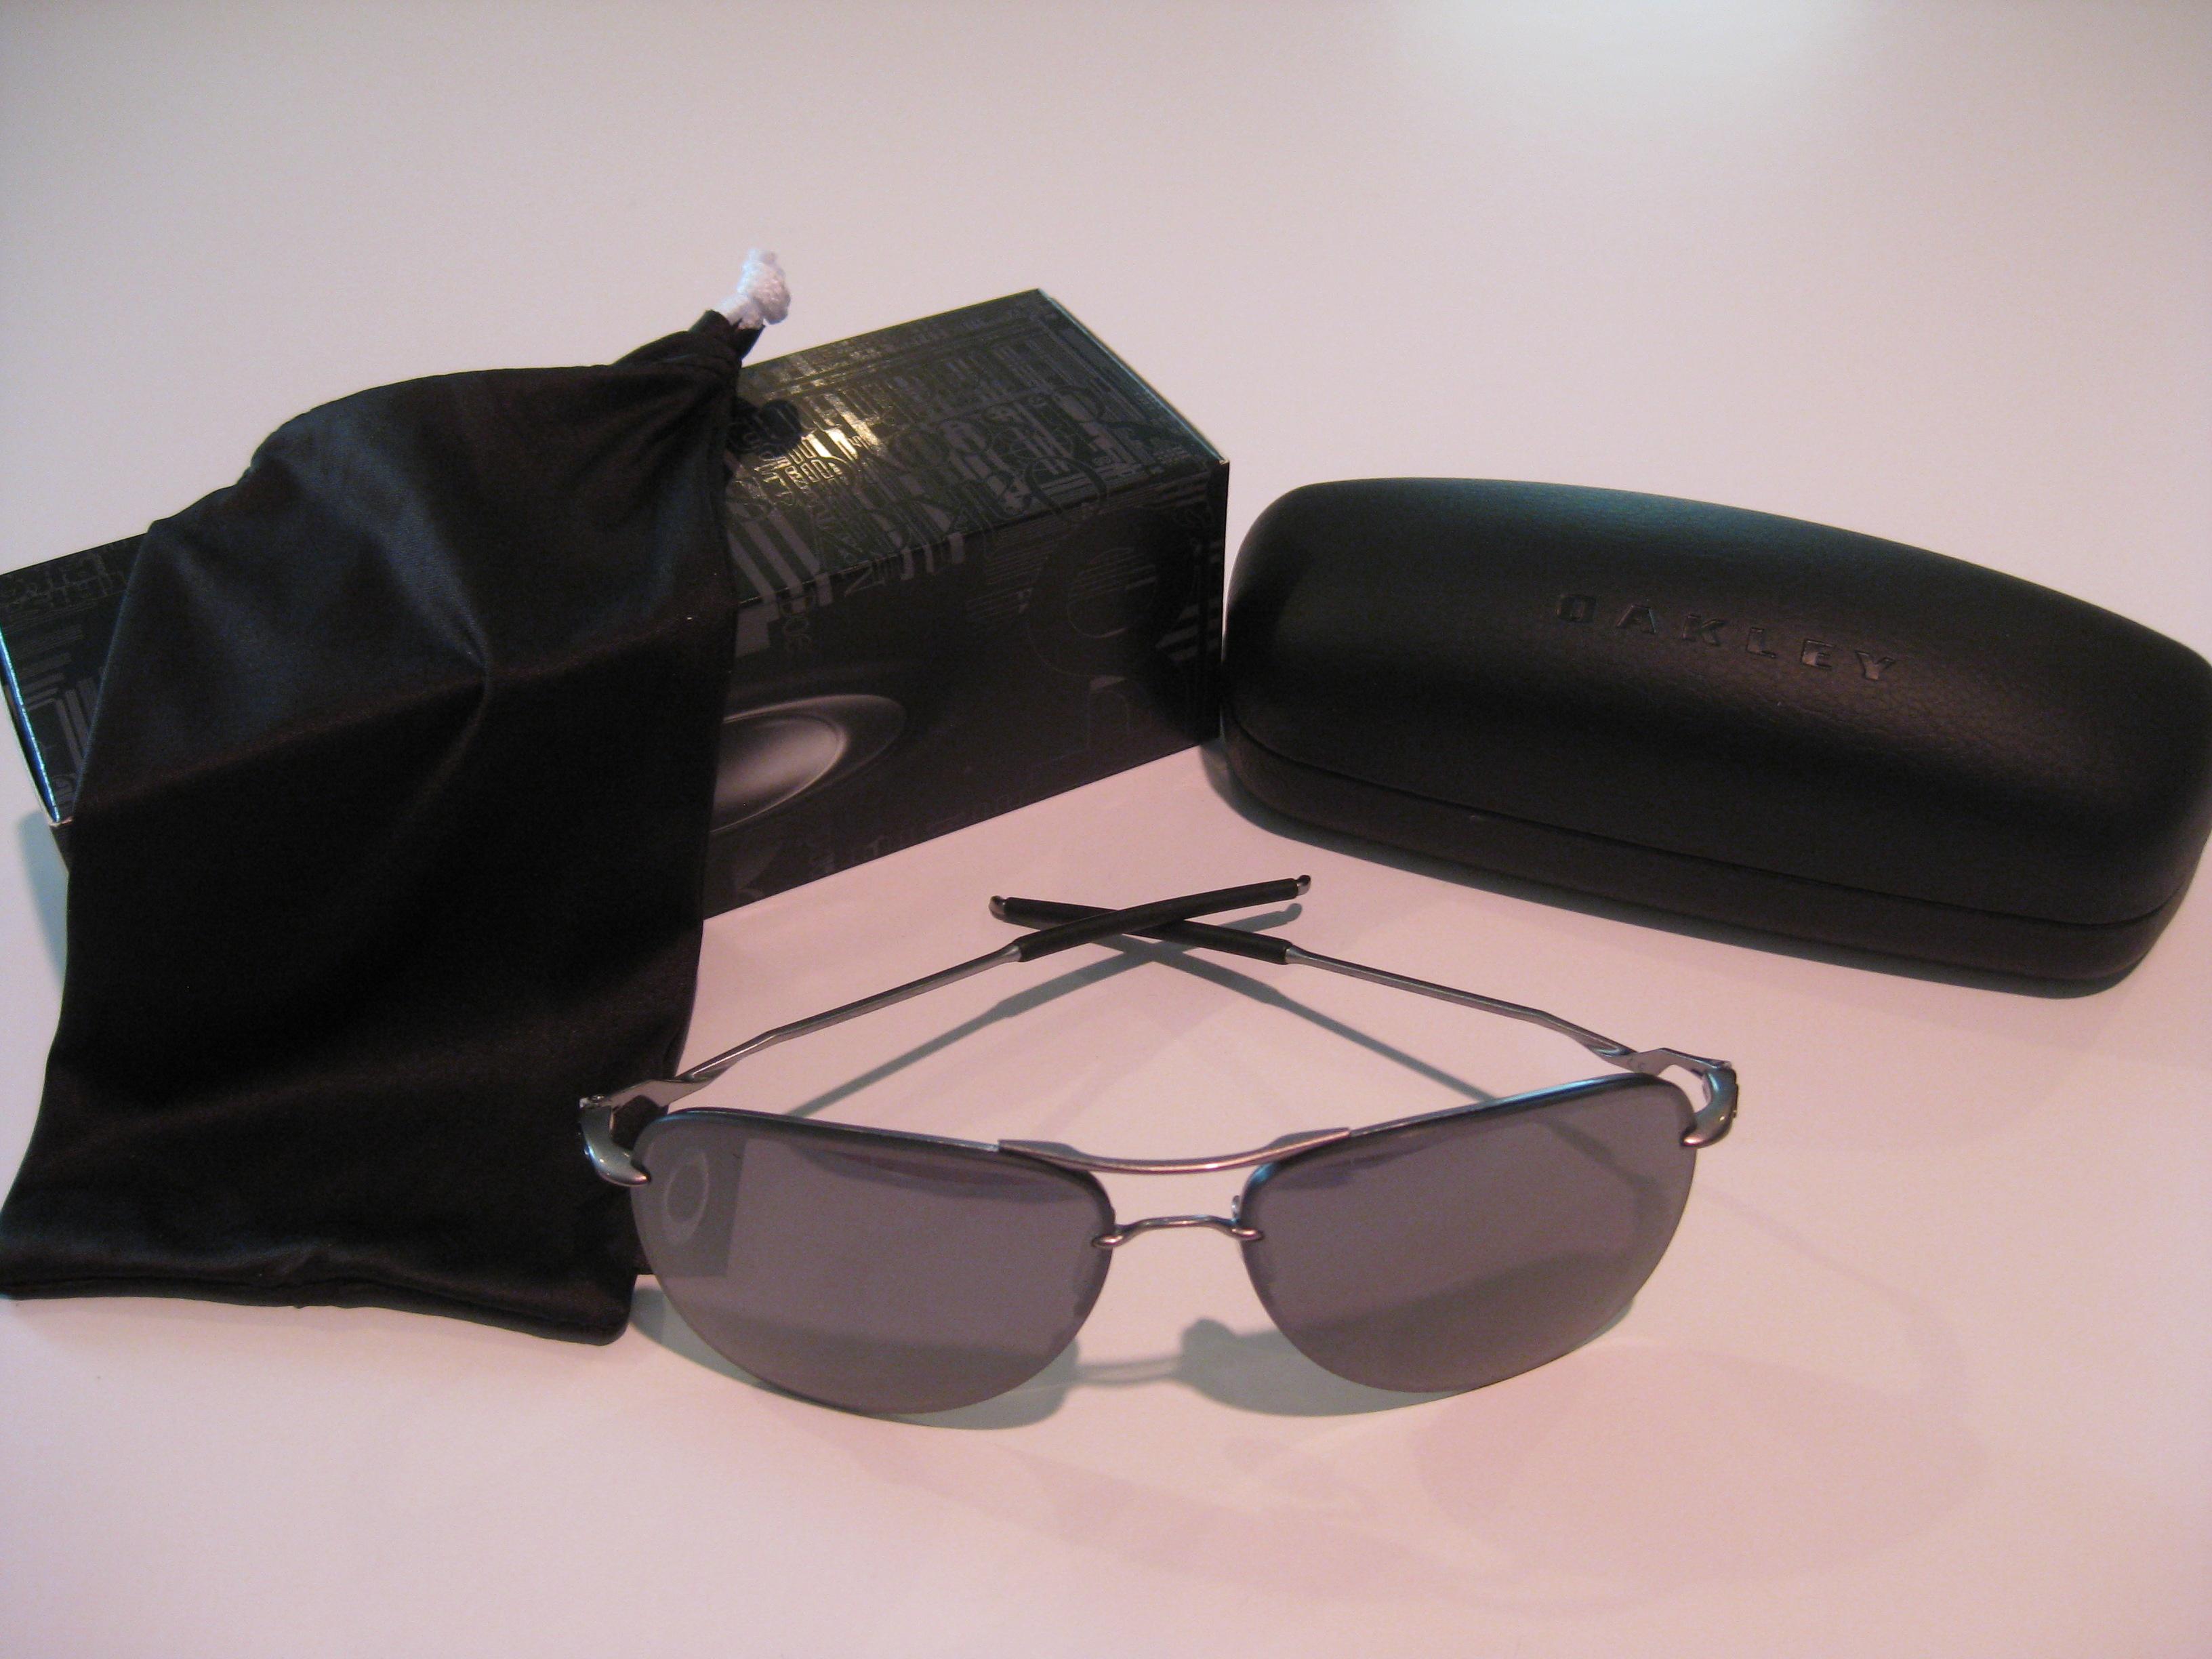 0ee86ac712 New Oakley Tailpin Sunglasses Lead Black Iridium OO4086-01